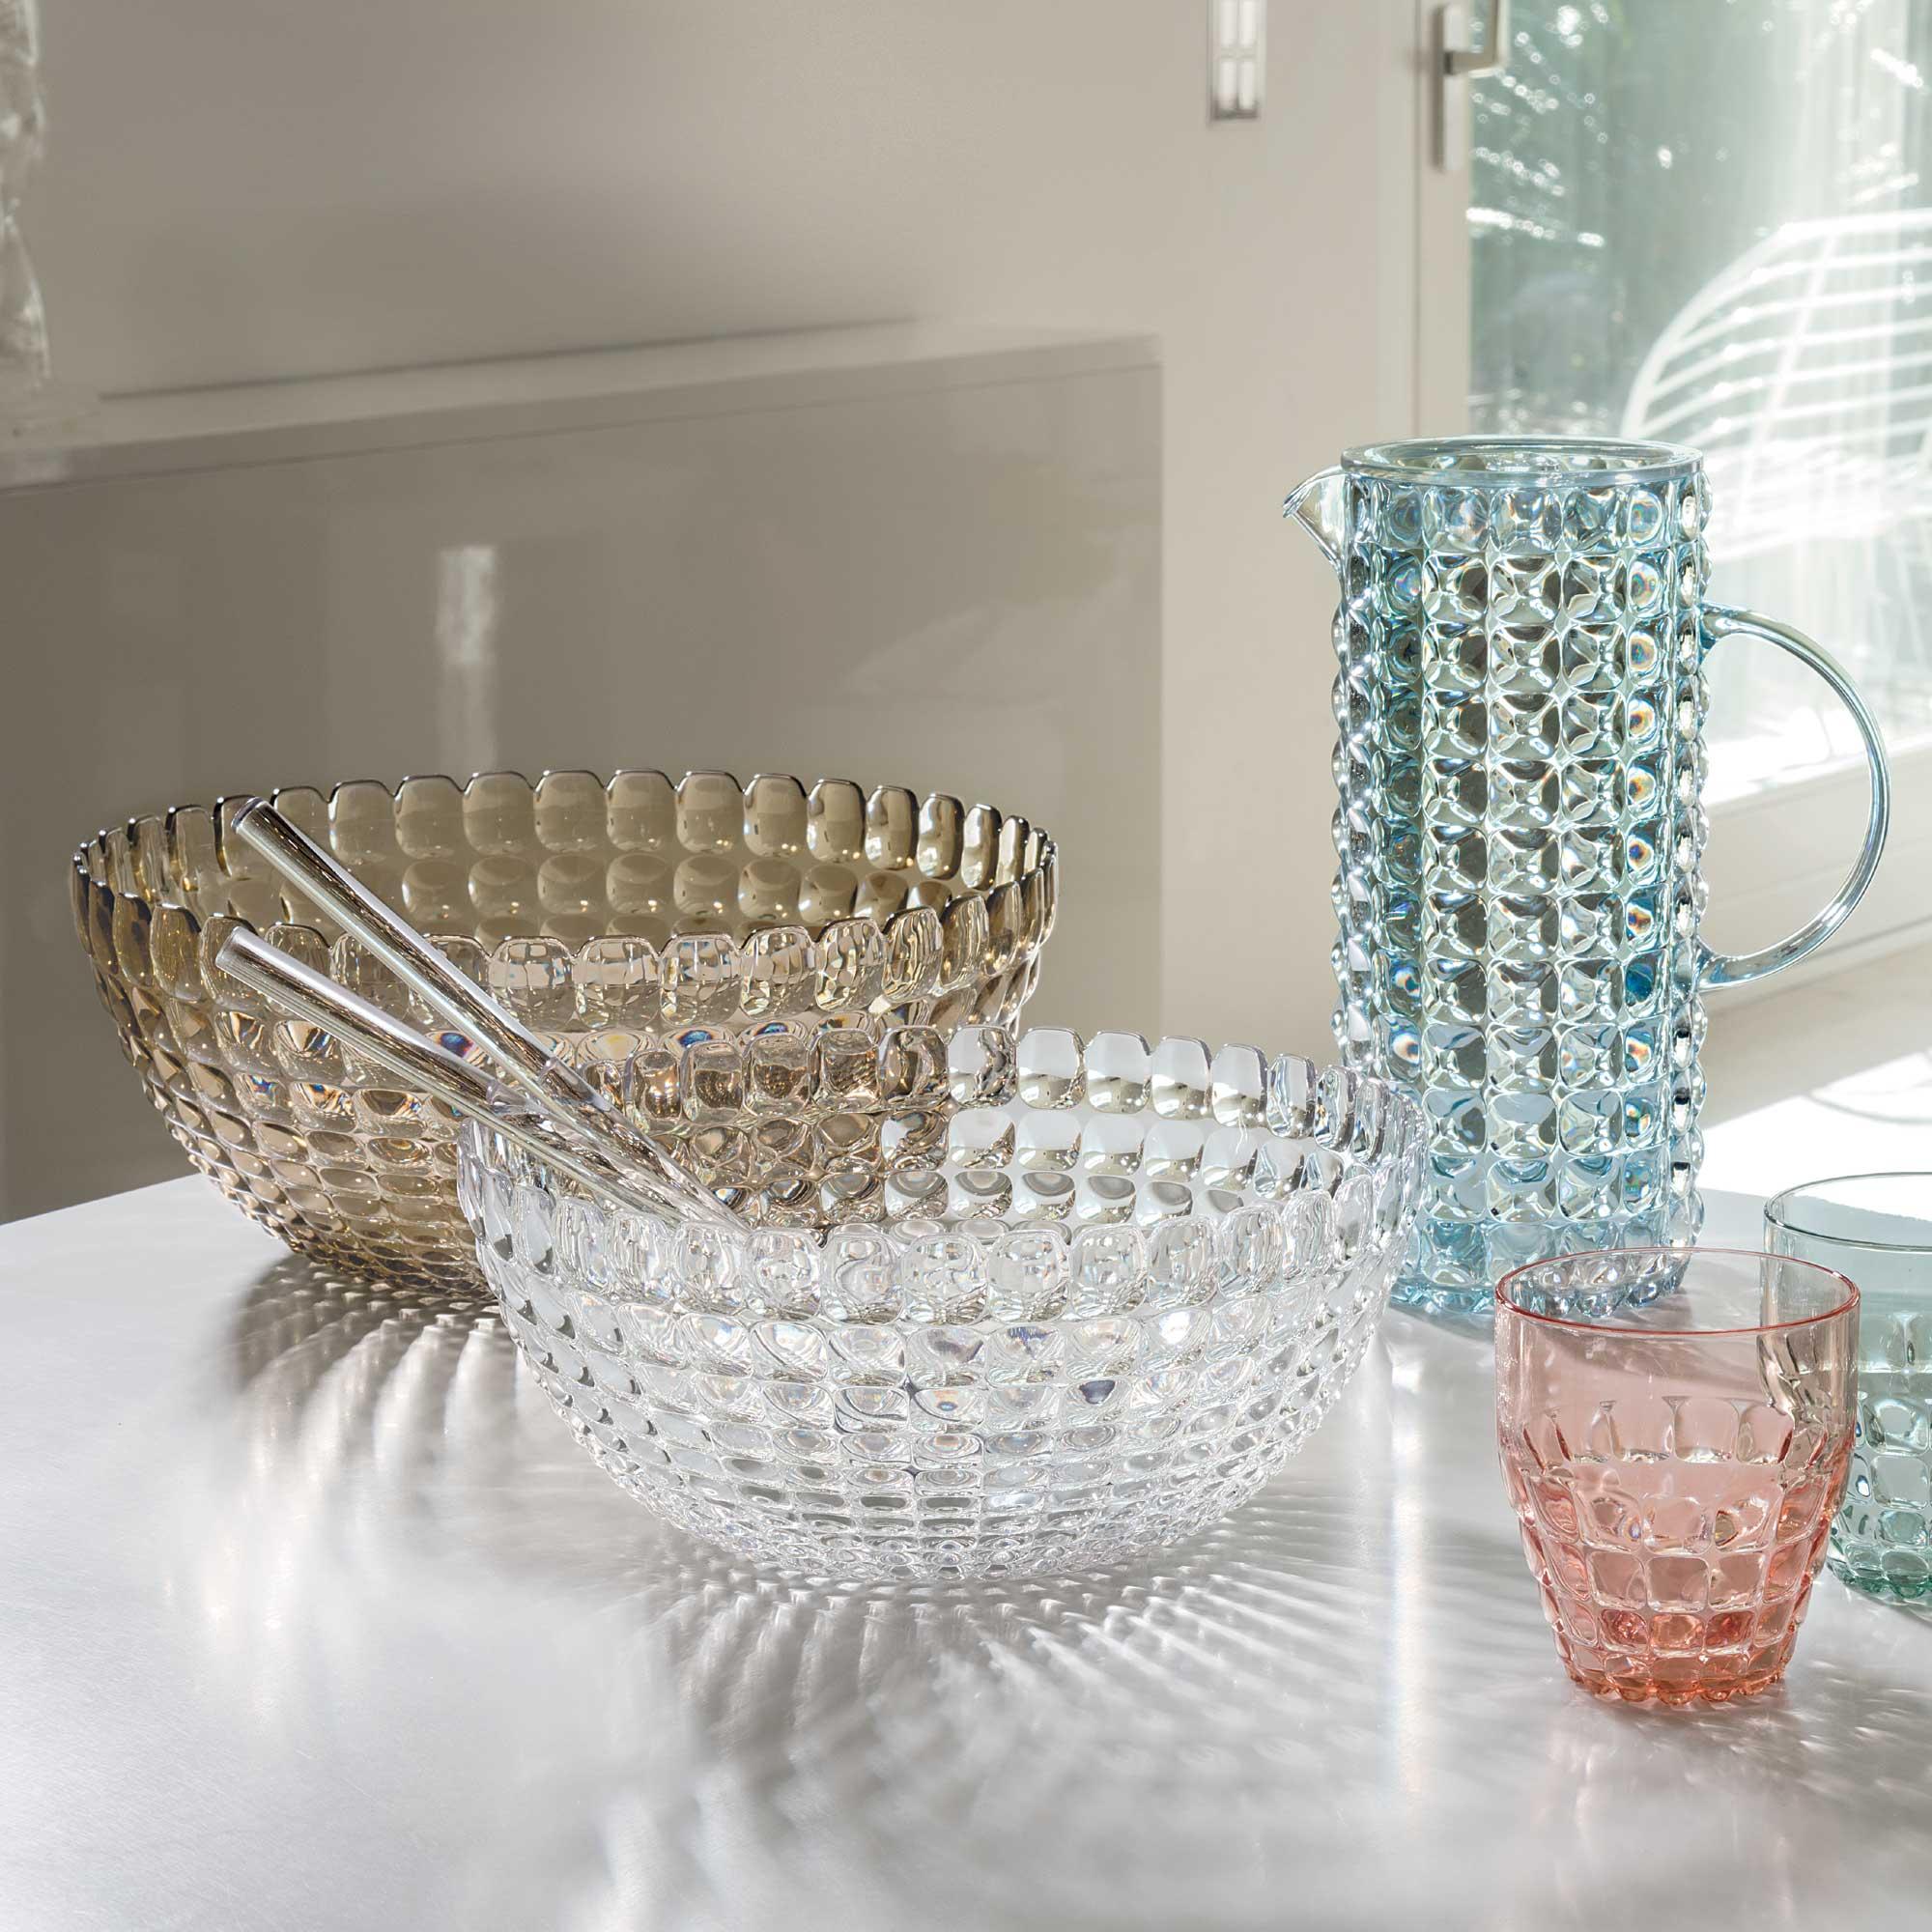 guzzini tiffany  Guzzini Tiffany L Bowl - Transparent Plastic w/ Sparkling Colour Effects